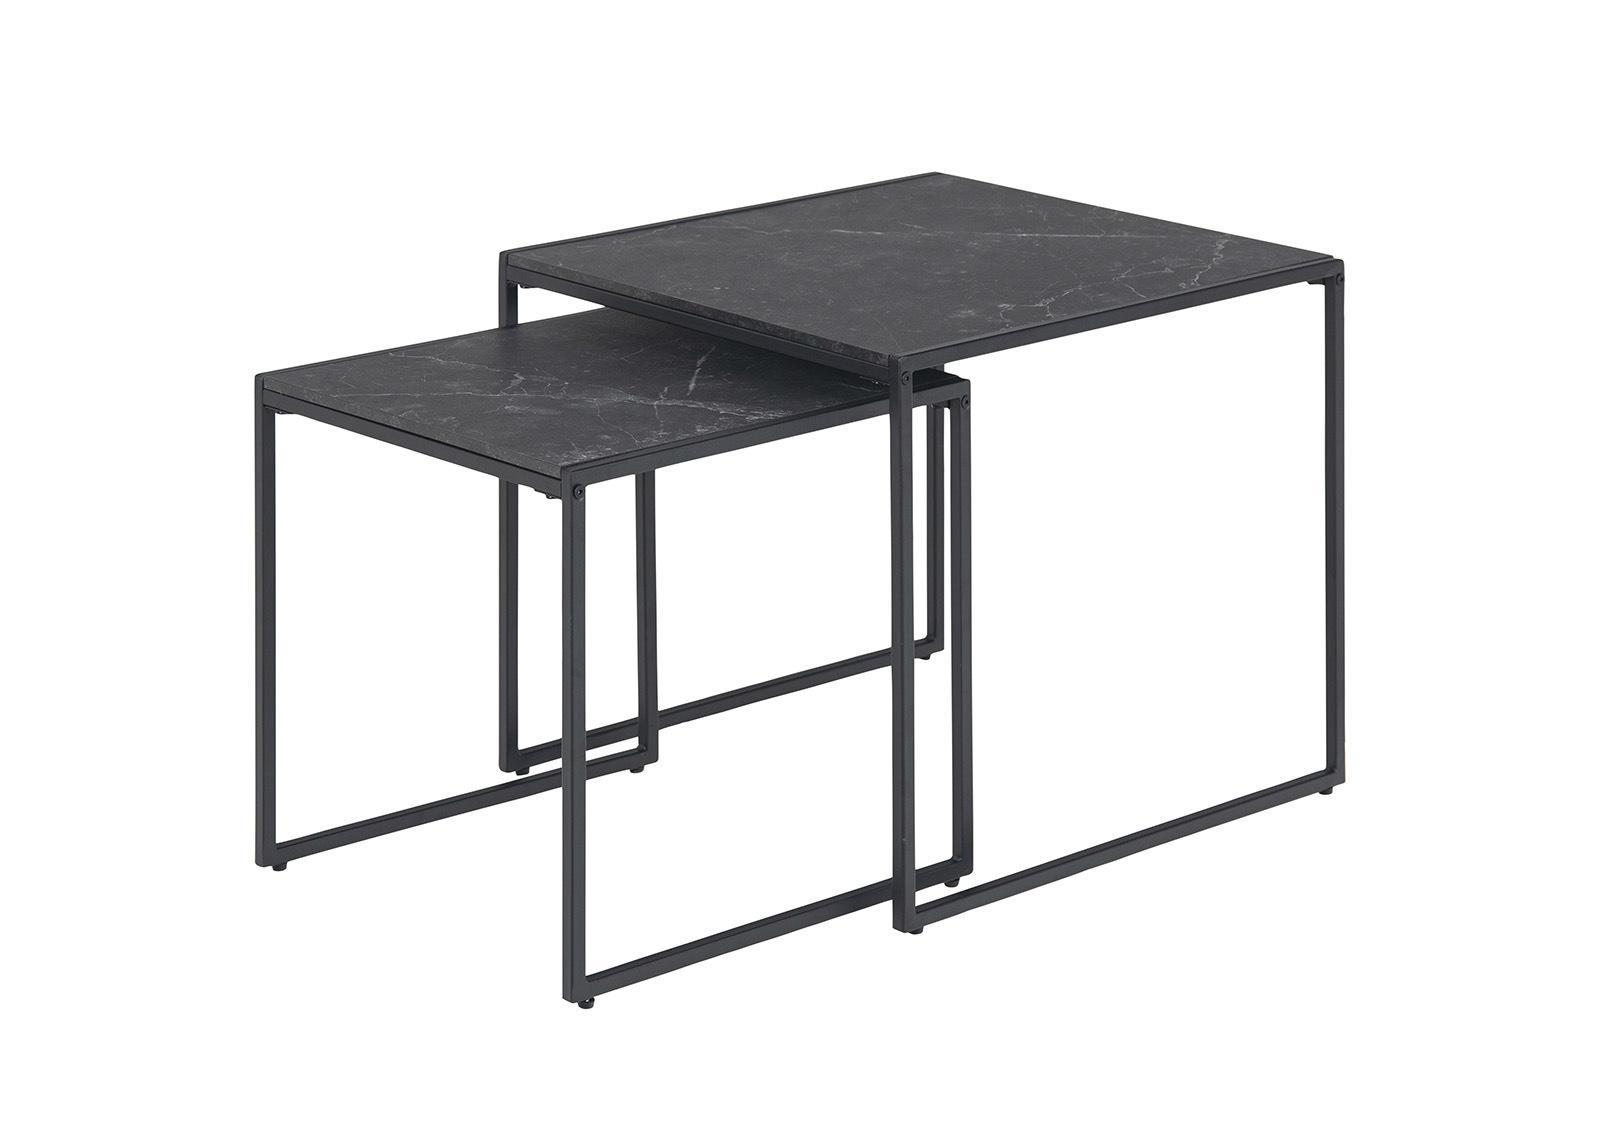 Sohvapöydät Infinity, 2 kpl